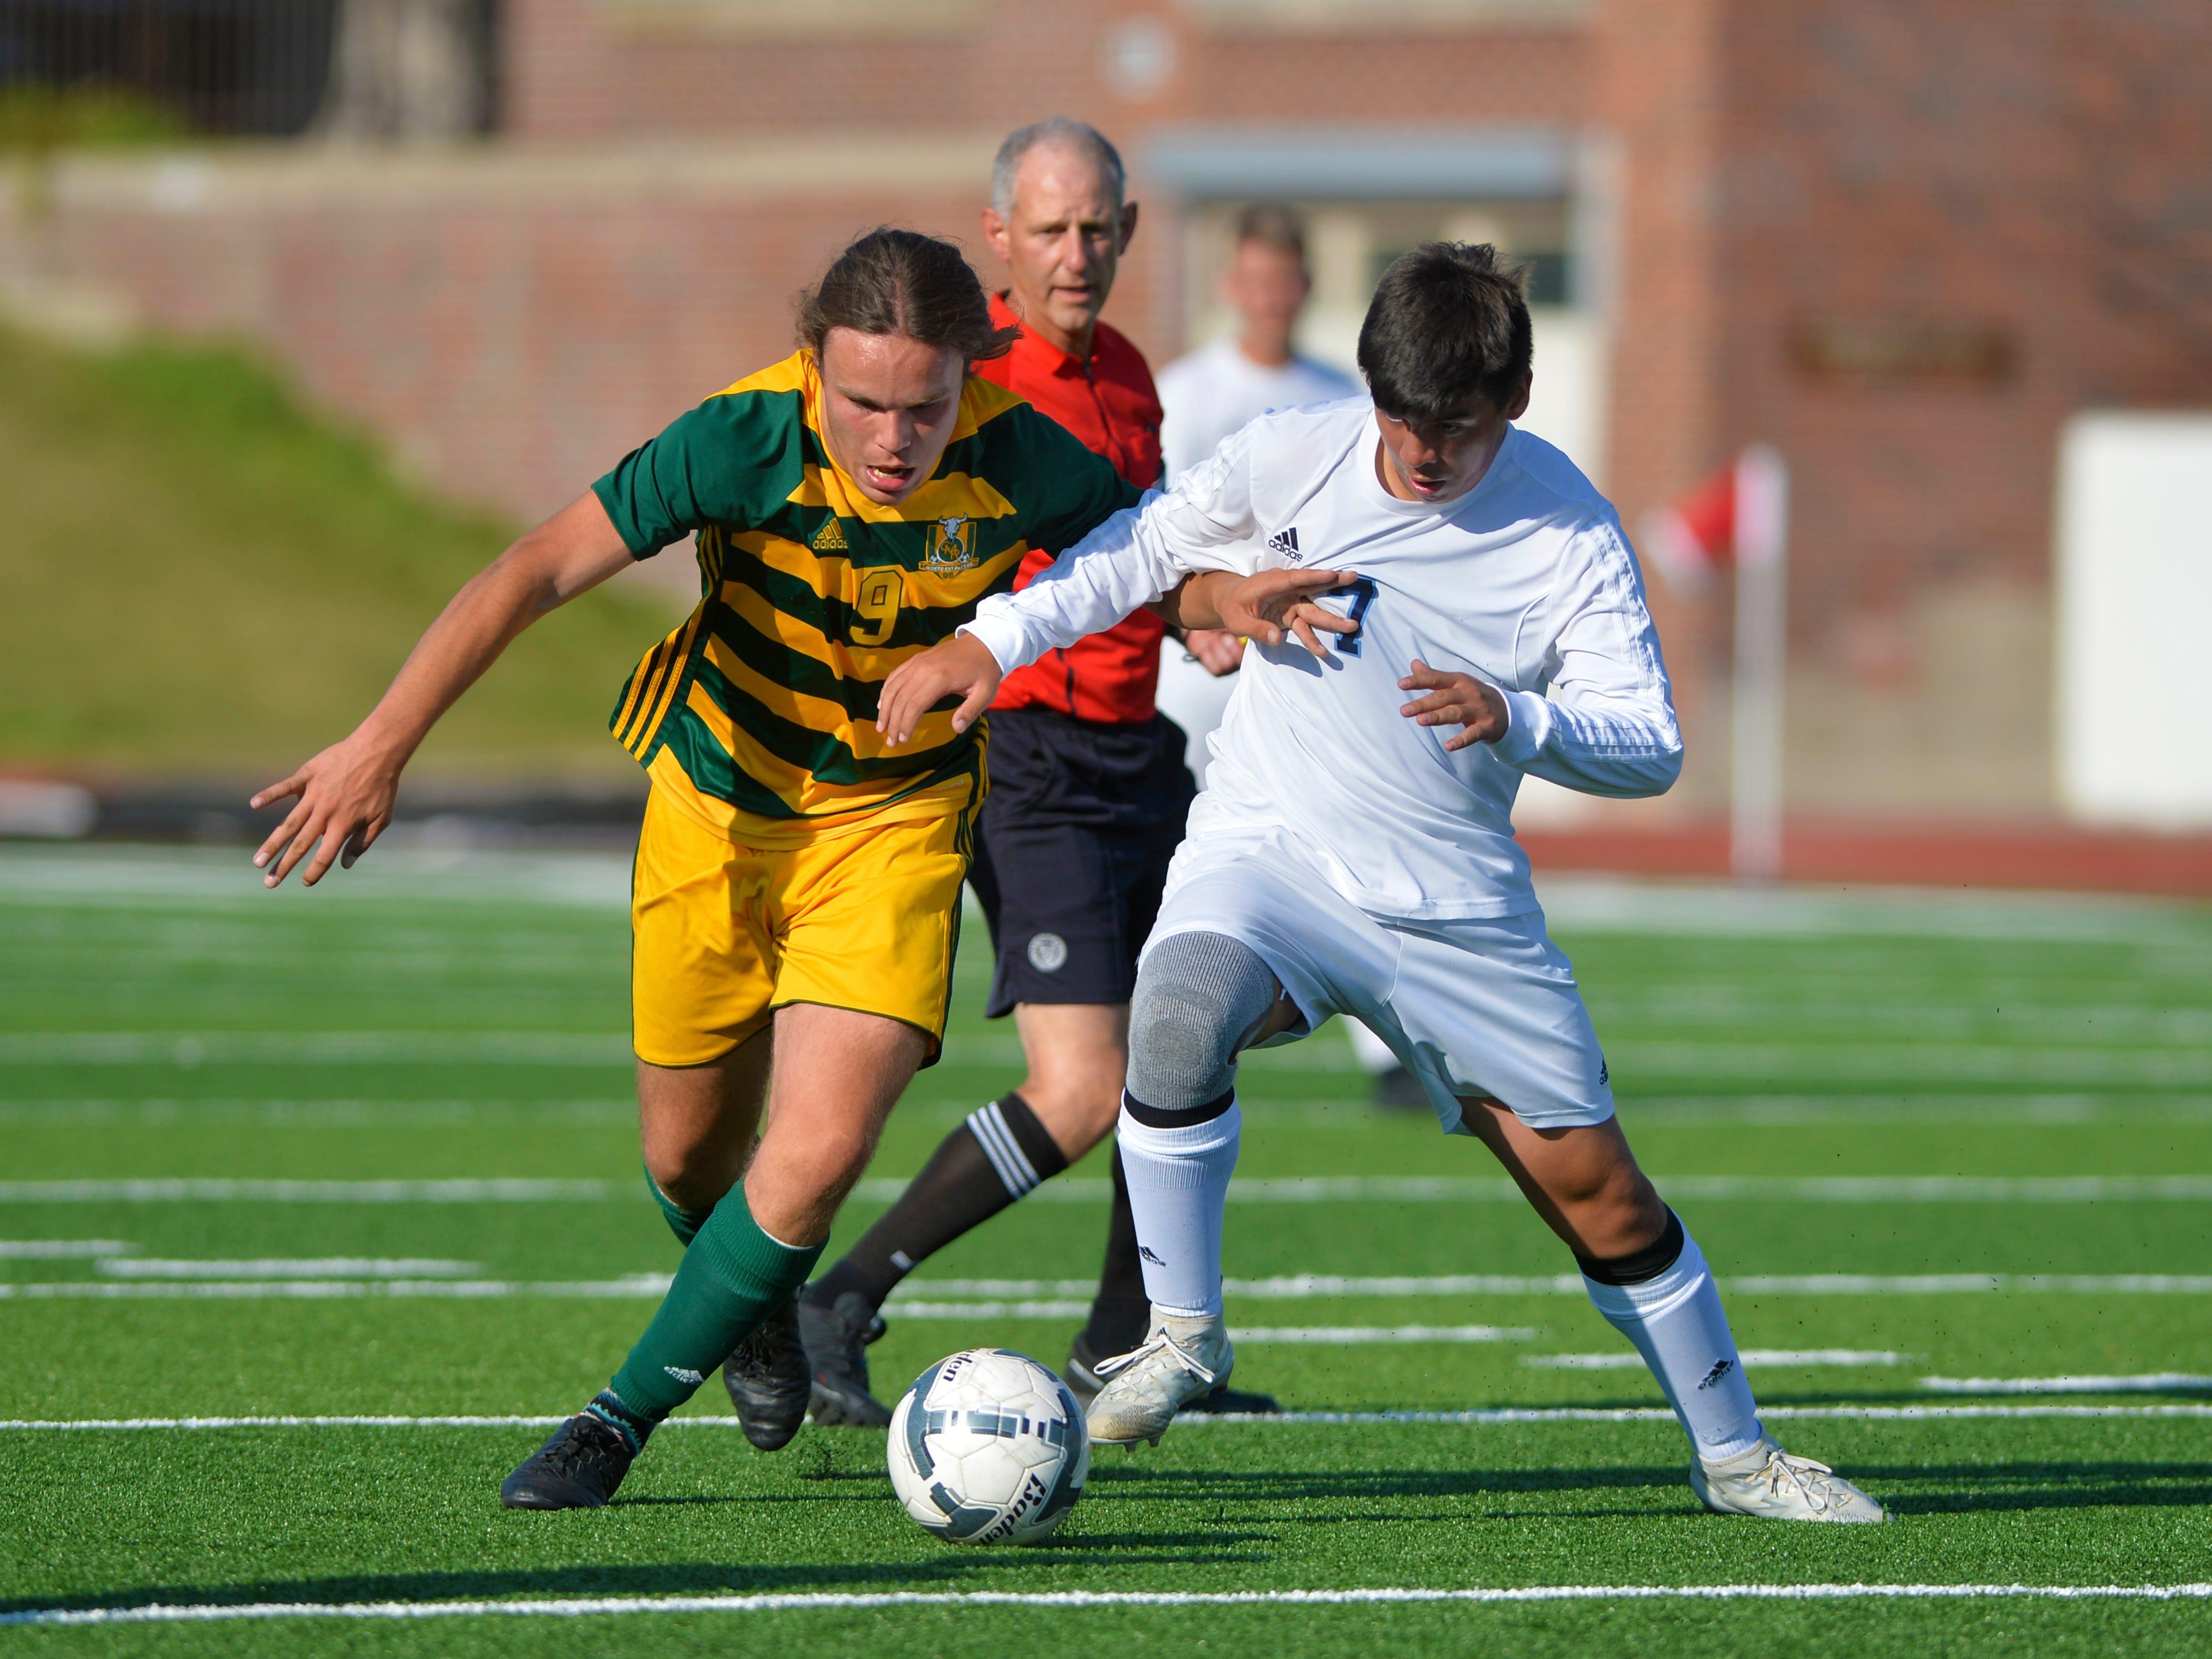 CMR's Seamus Jennings and Great Falls High's Zek Herrera battle for the ball suring the crosstown soccer match at Memorial Stadium, Thursday, Sept. 6, 2018.